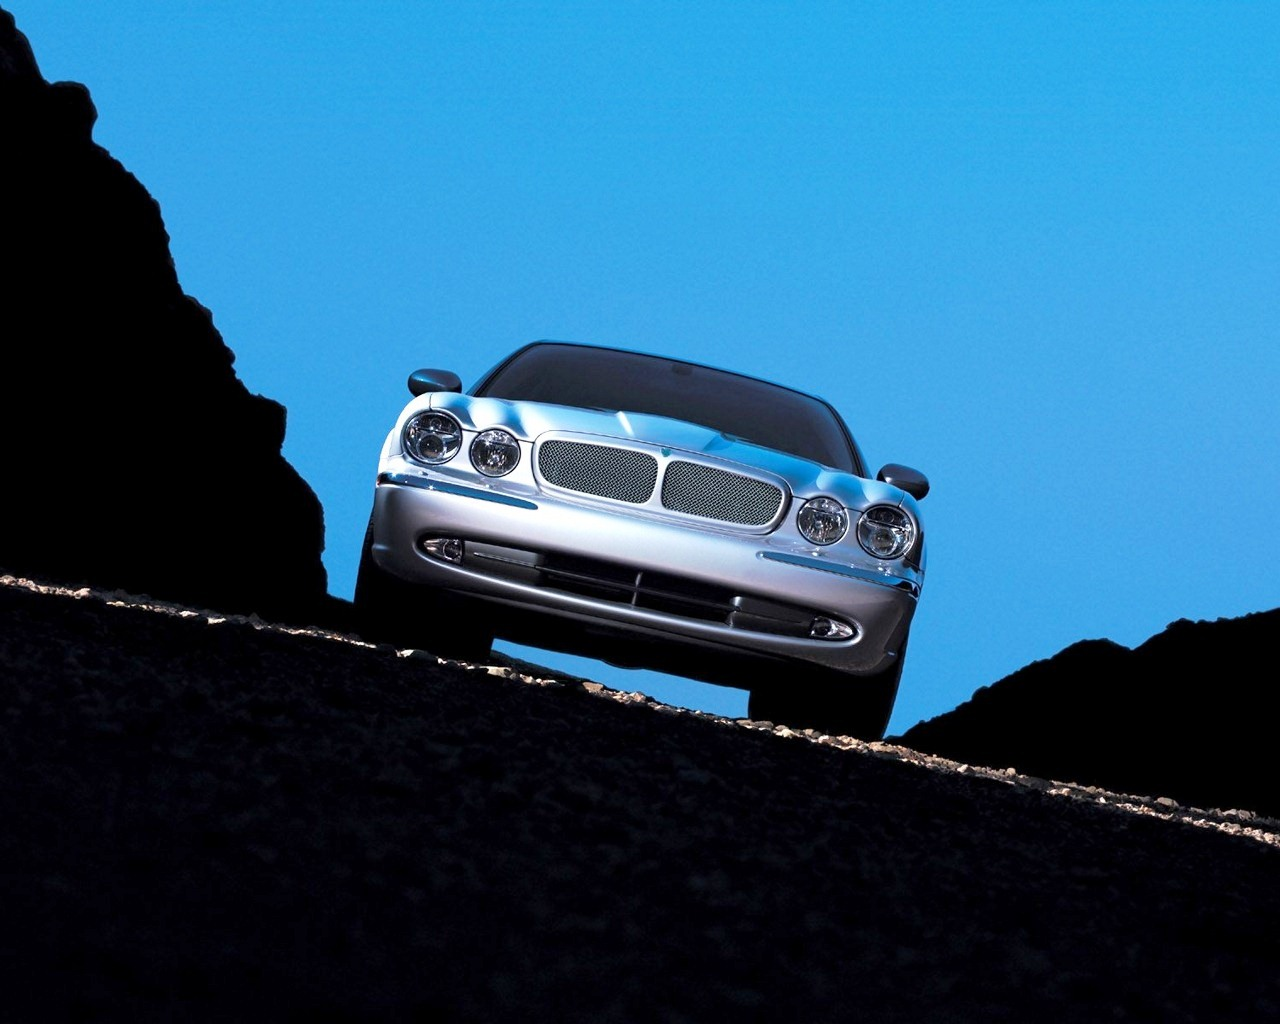 http://1.bp.blogspot.com/-KfGgBiGscnI/T6HyC9548jI/AAAAAAAABMk/vhjP_JEdv7E/s1600/Jaguar_HD_Car_Wallpaper_Blu_Ray_1080p+%252838%2529.jpg